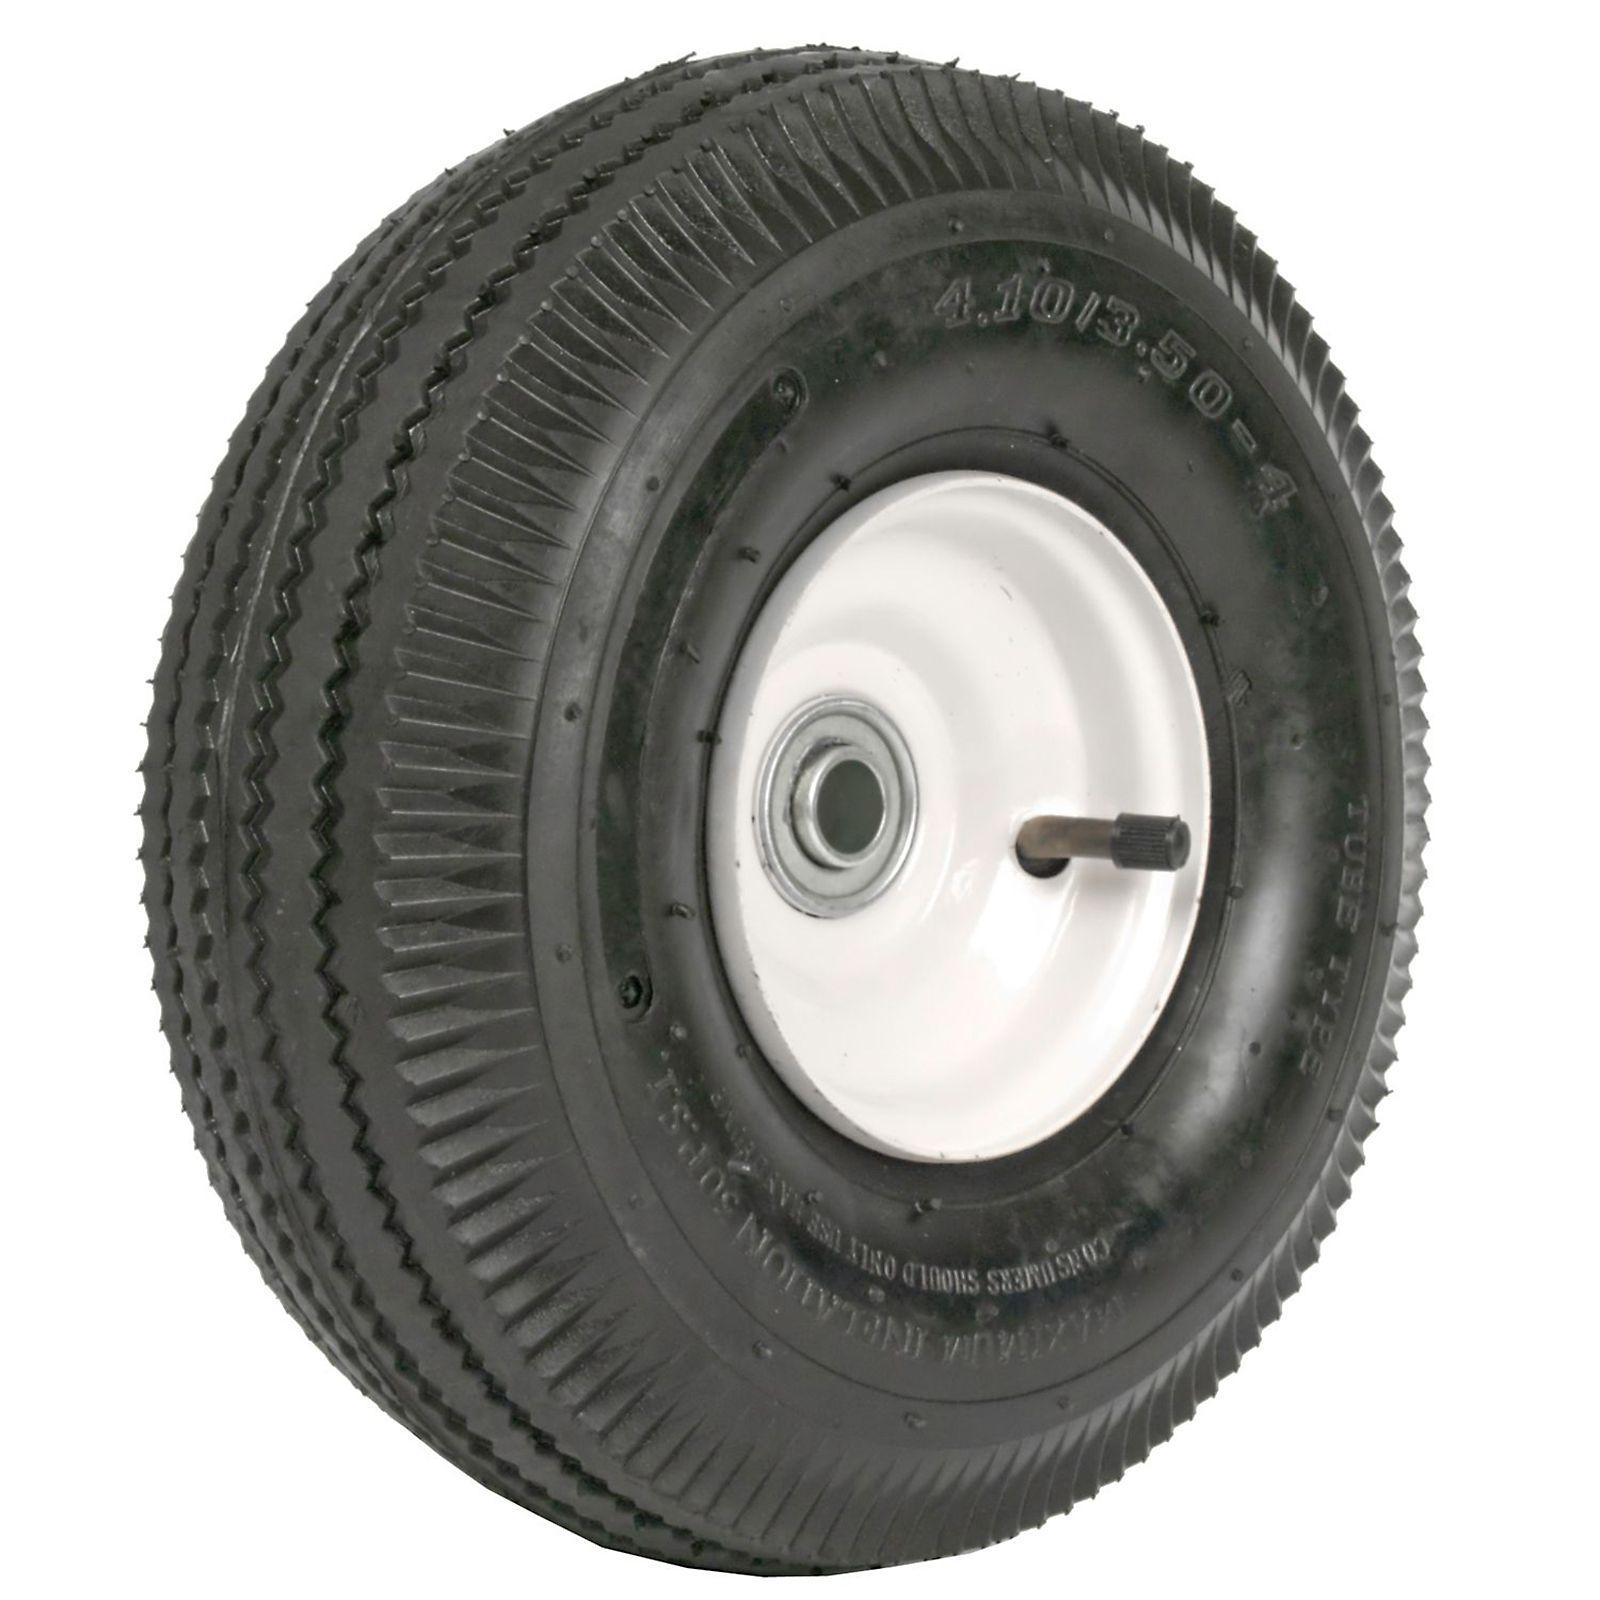 Martin Wheel 354dc4sw242ip 410 350 4 10 Inch Hand Truck Wheel 2 1 4x5 8 Inch Offset Hub Steel Hand Trucks Truck Wheels Martin